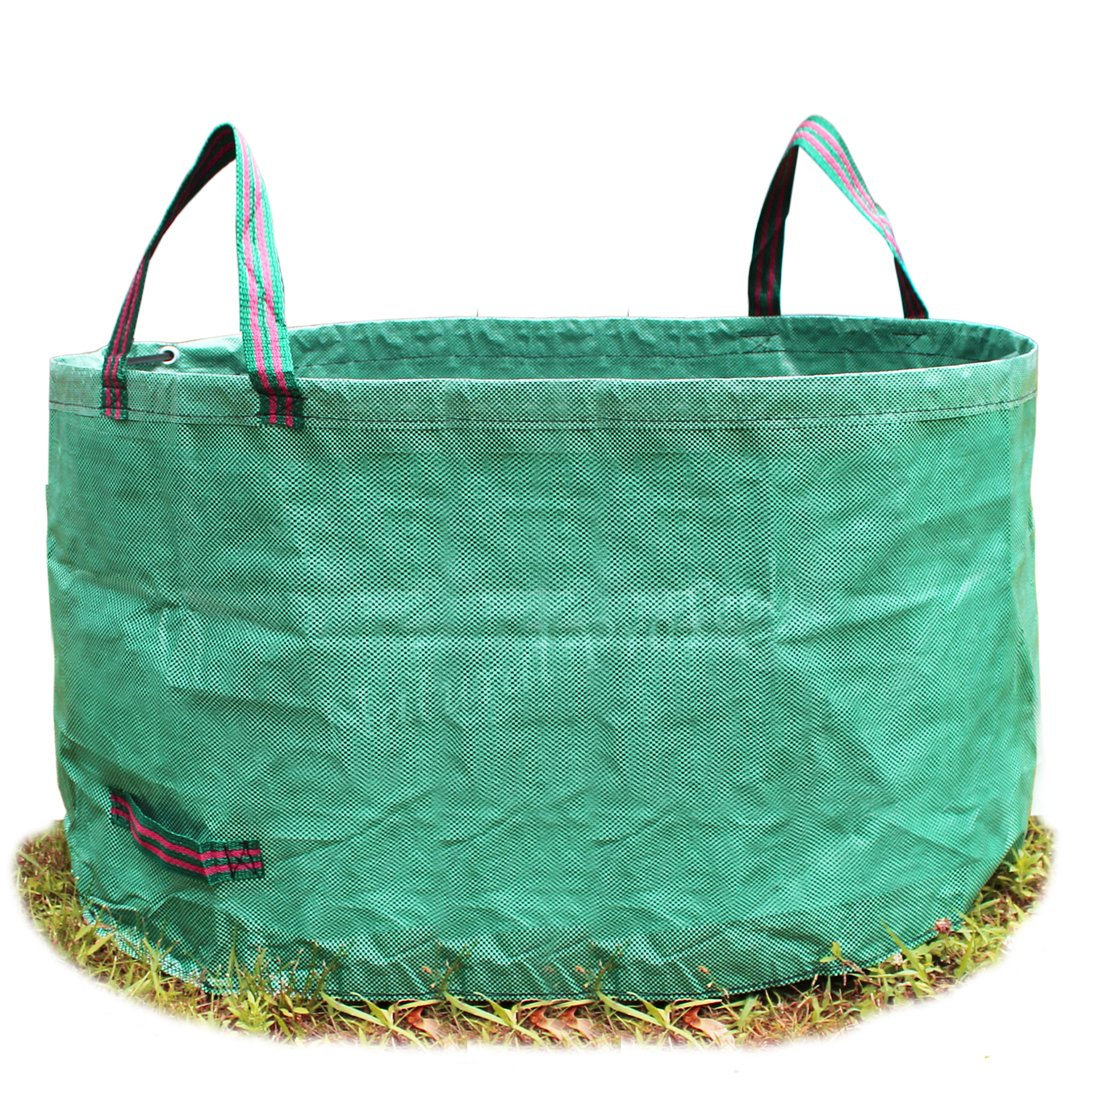 Natural ProTech Garden Reusable Leaf Bag 8.5 Cubic Foot Yard Lawn Gardening Waste Bag 63Gal